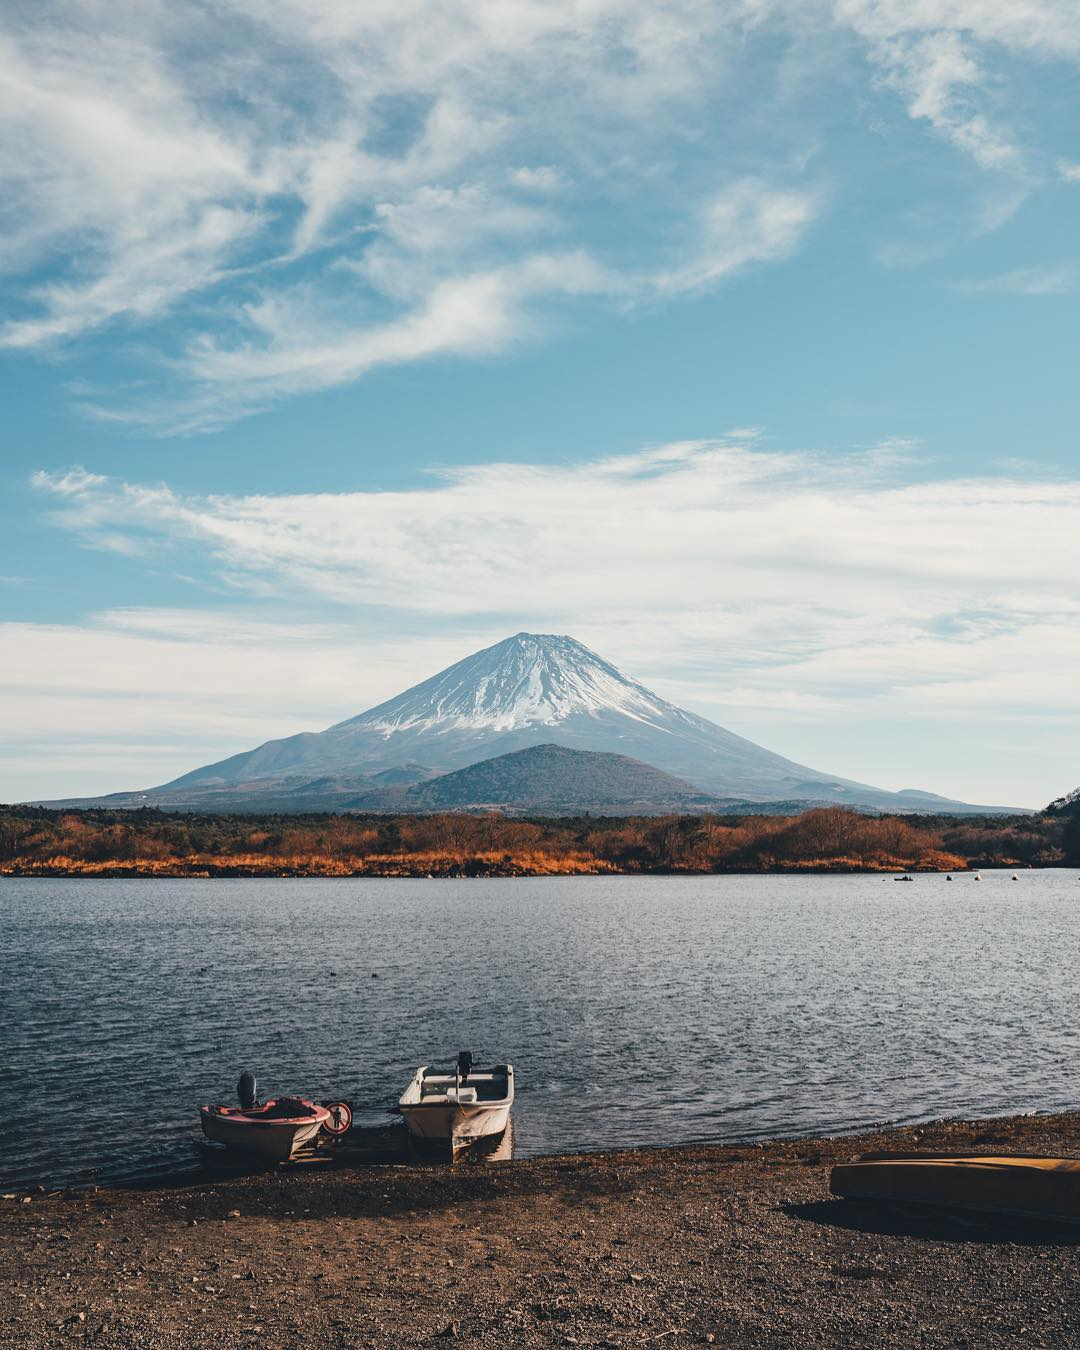 Hiro Goto Mt. Fuji Photograph